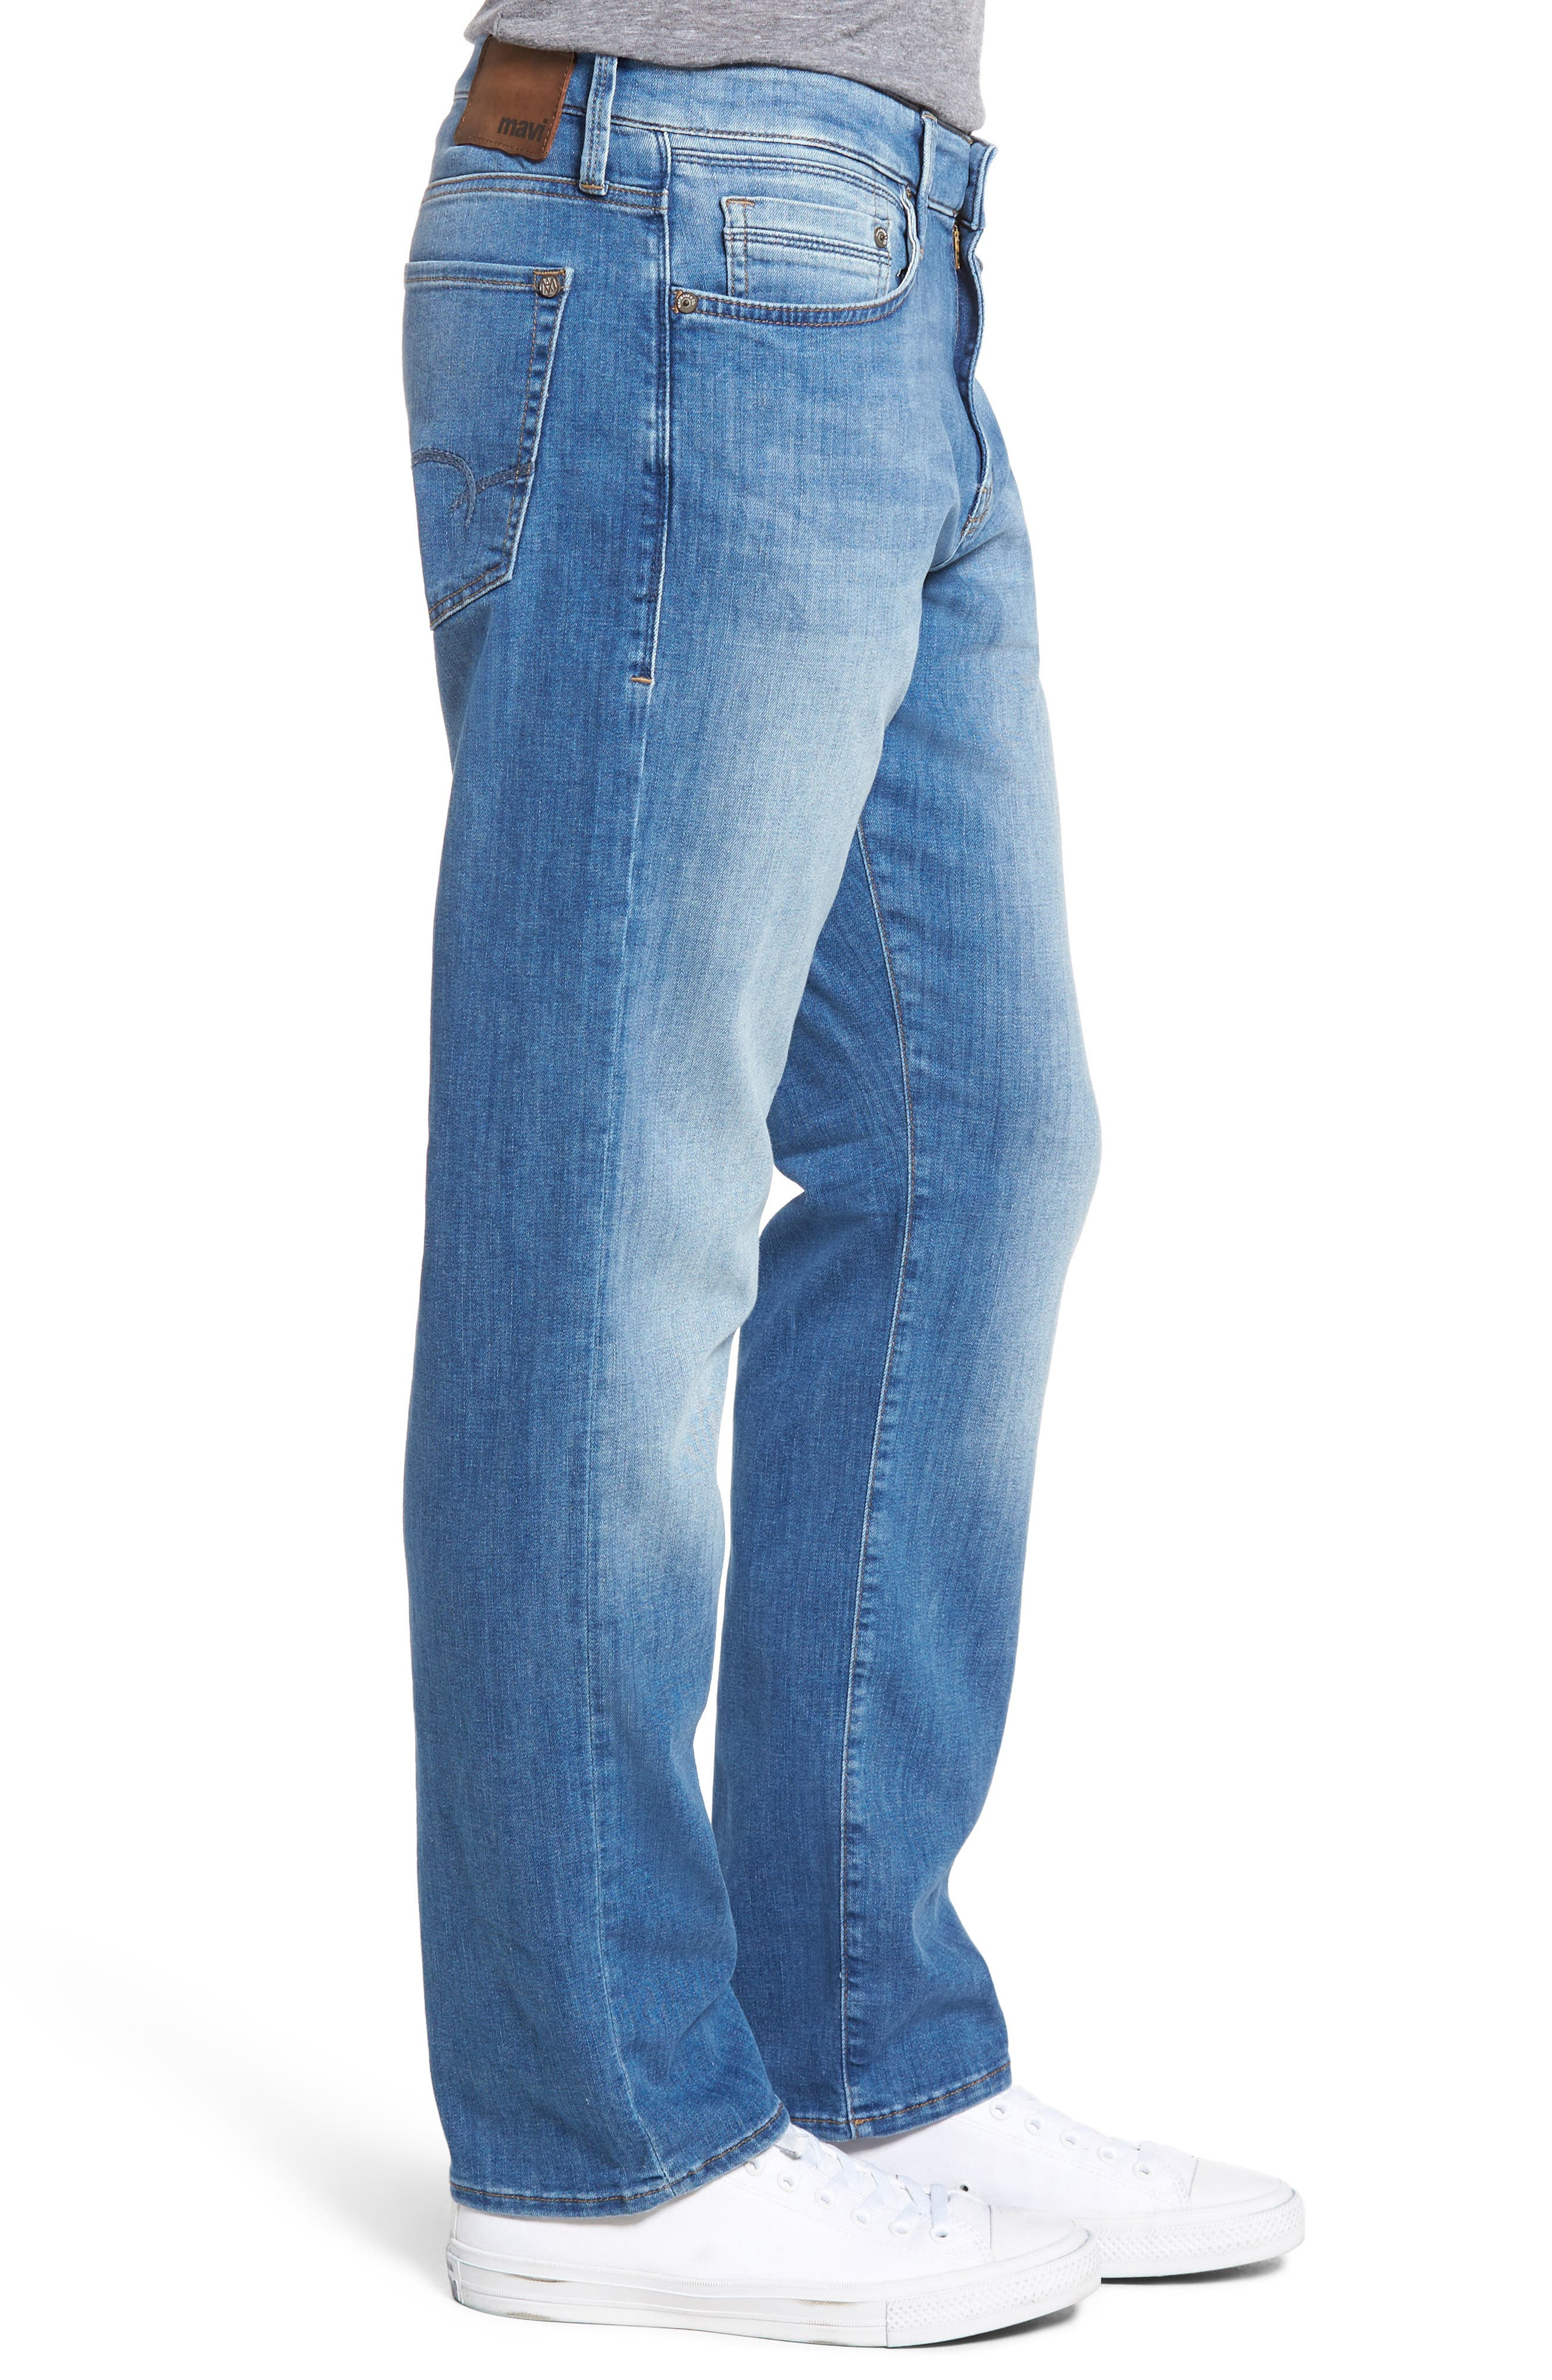 Myles Straight Leg Jeans,                             Alternate thumbnail 3, color,